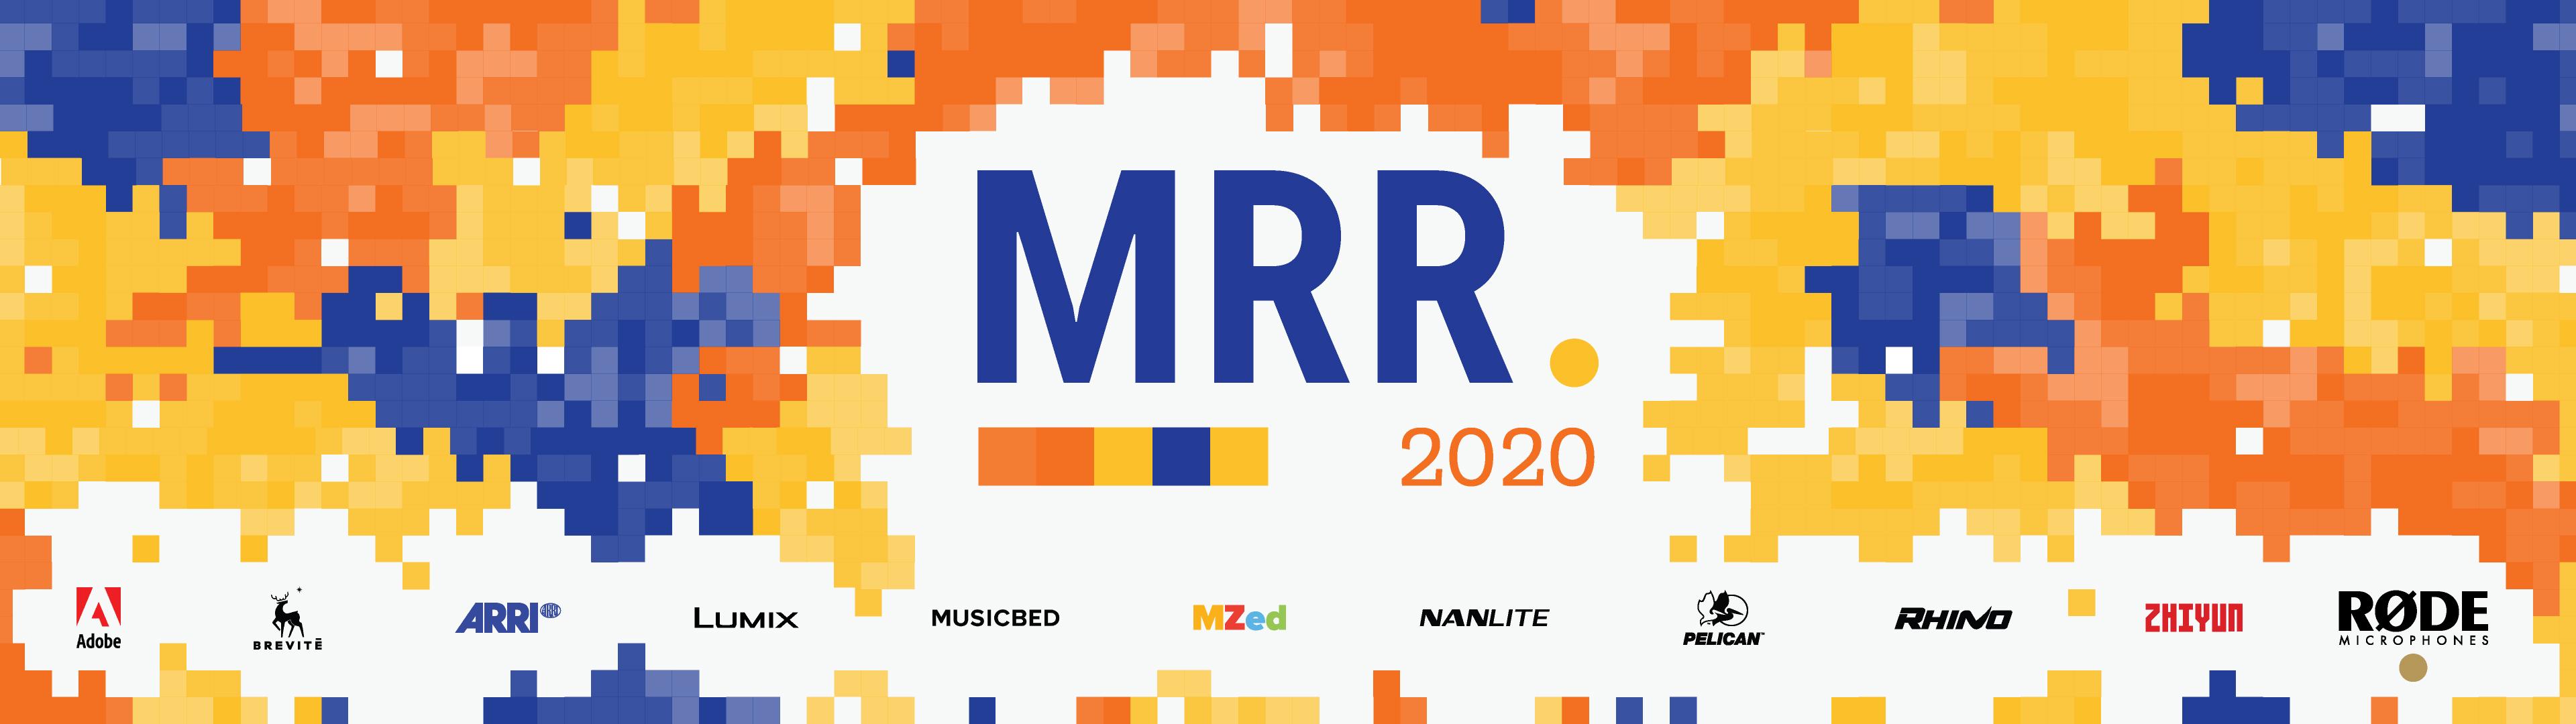 My RØDE Reel 2020 - Never Held